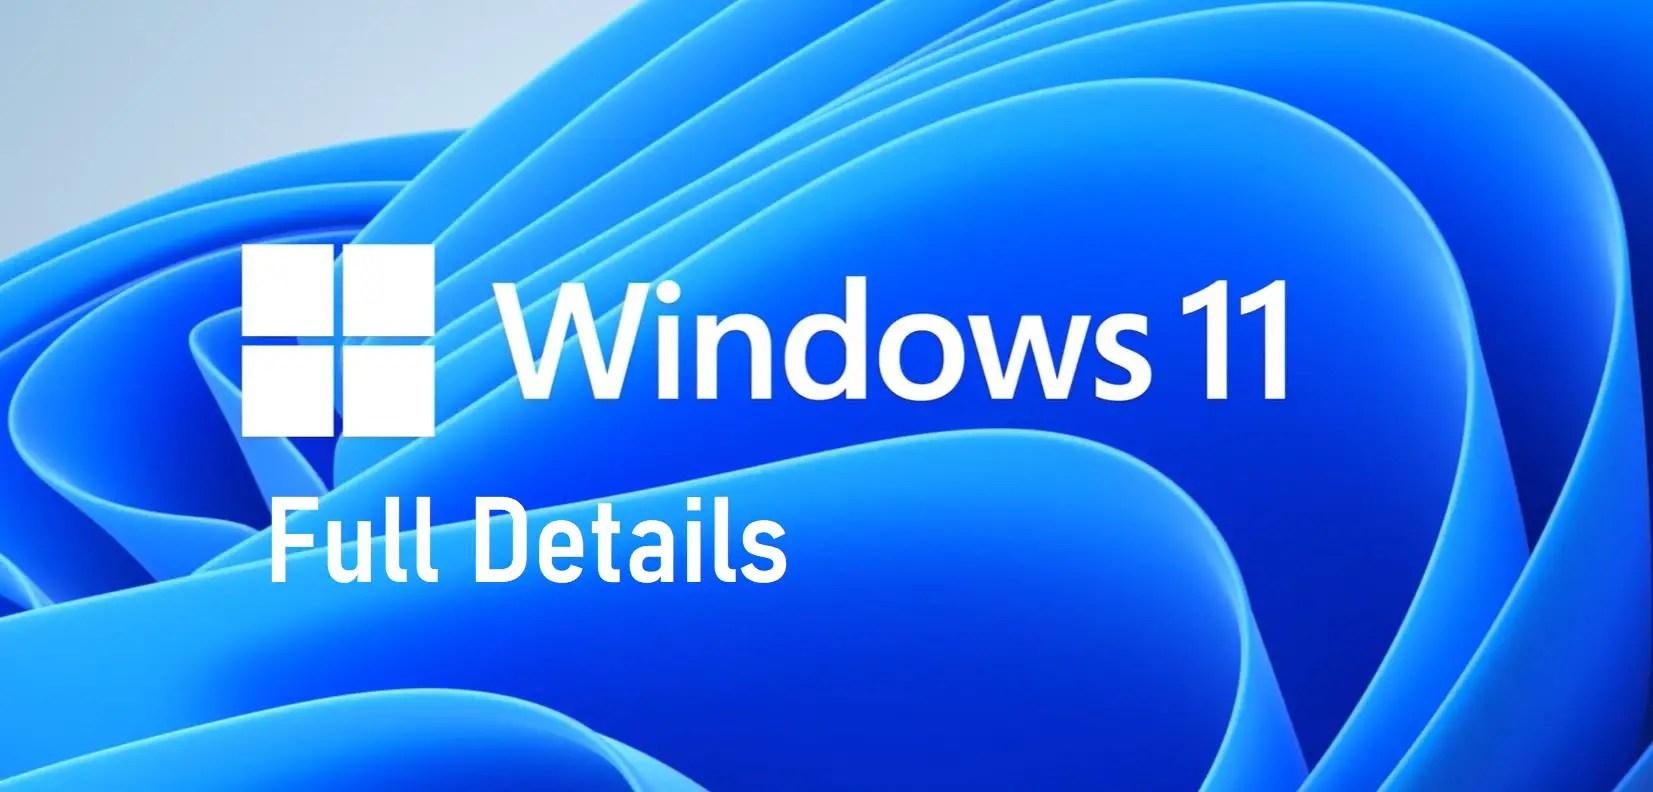 Windows 11 features, release date, beta, download